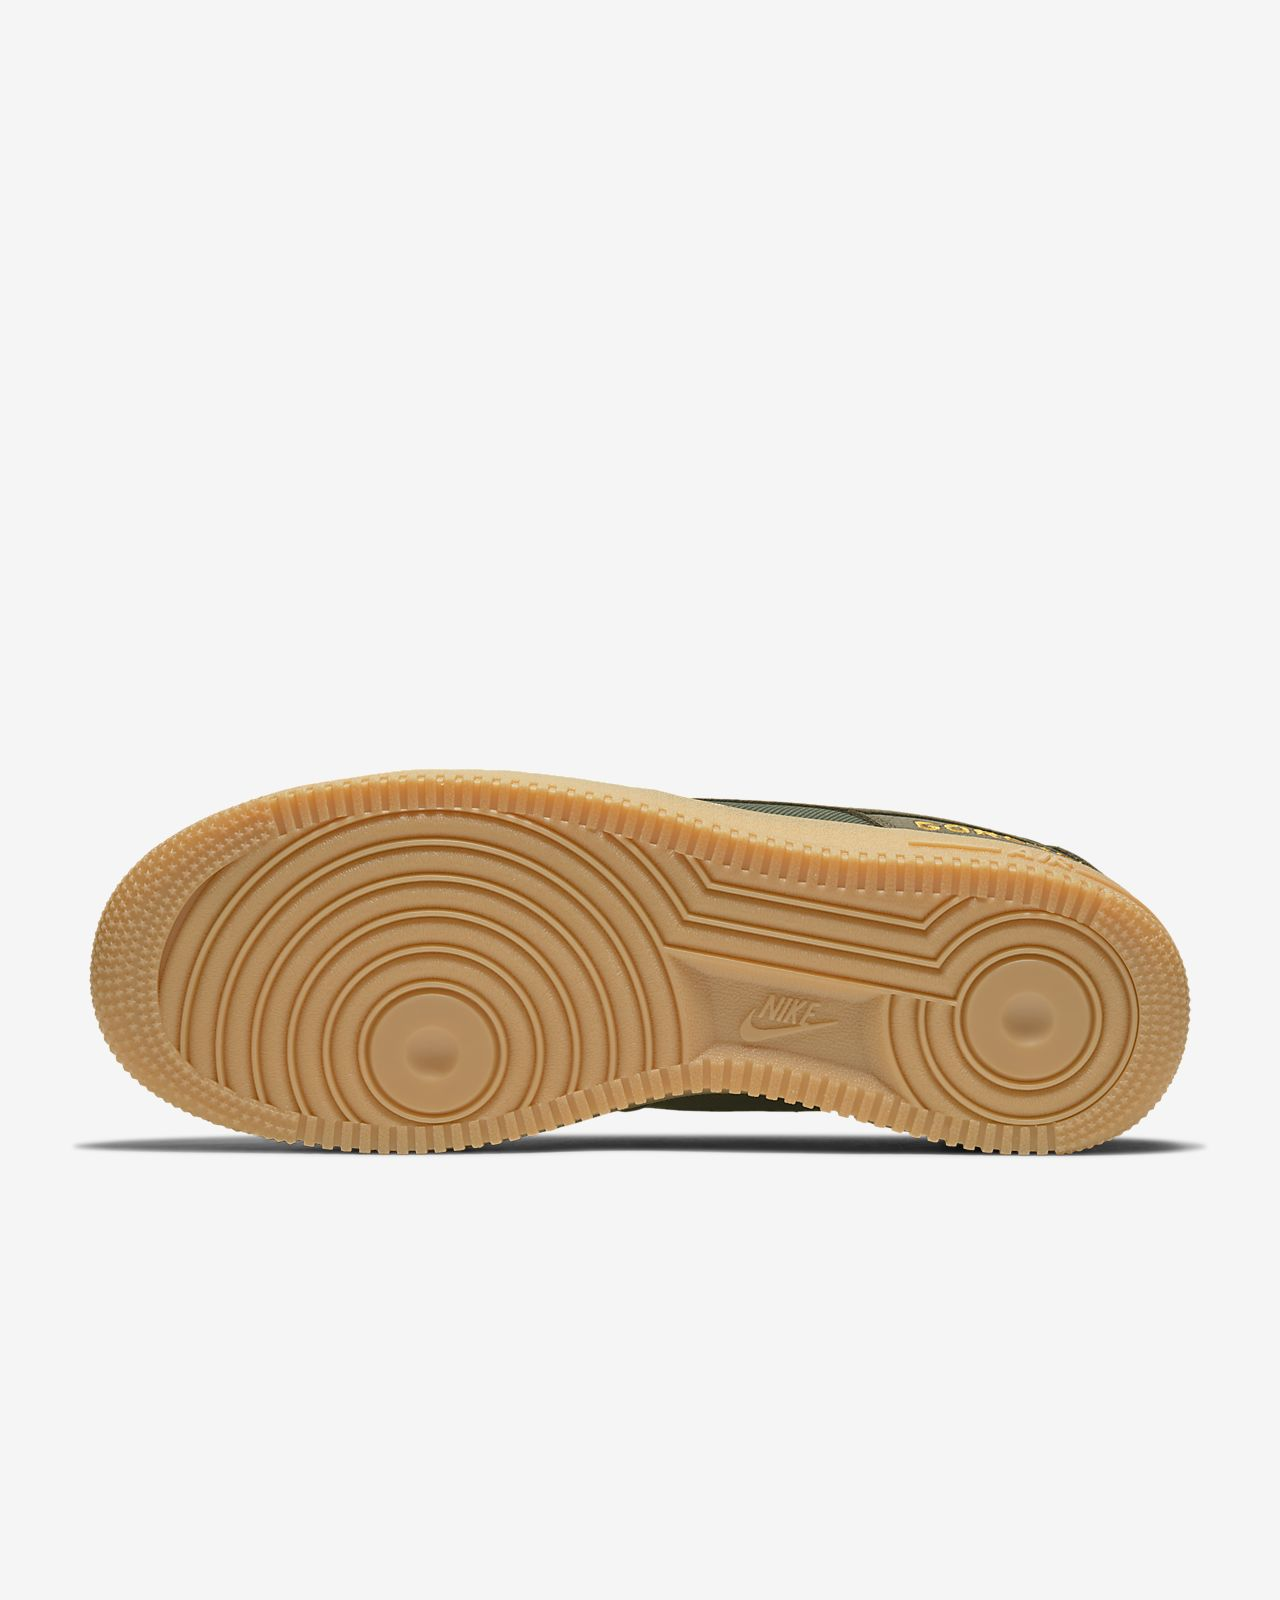 Sko Nike Air Force 1 GORE TEX